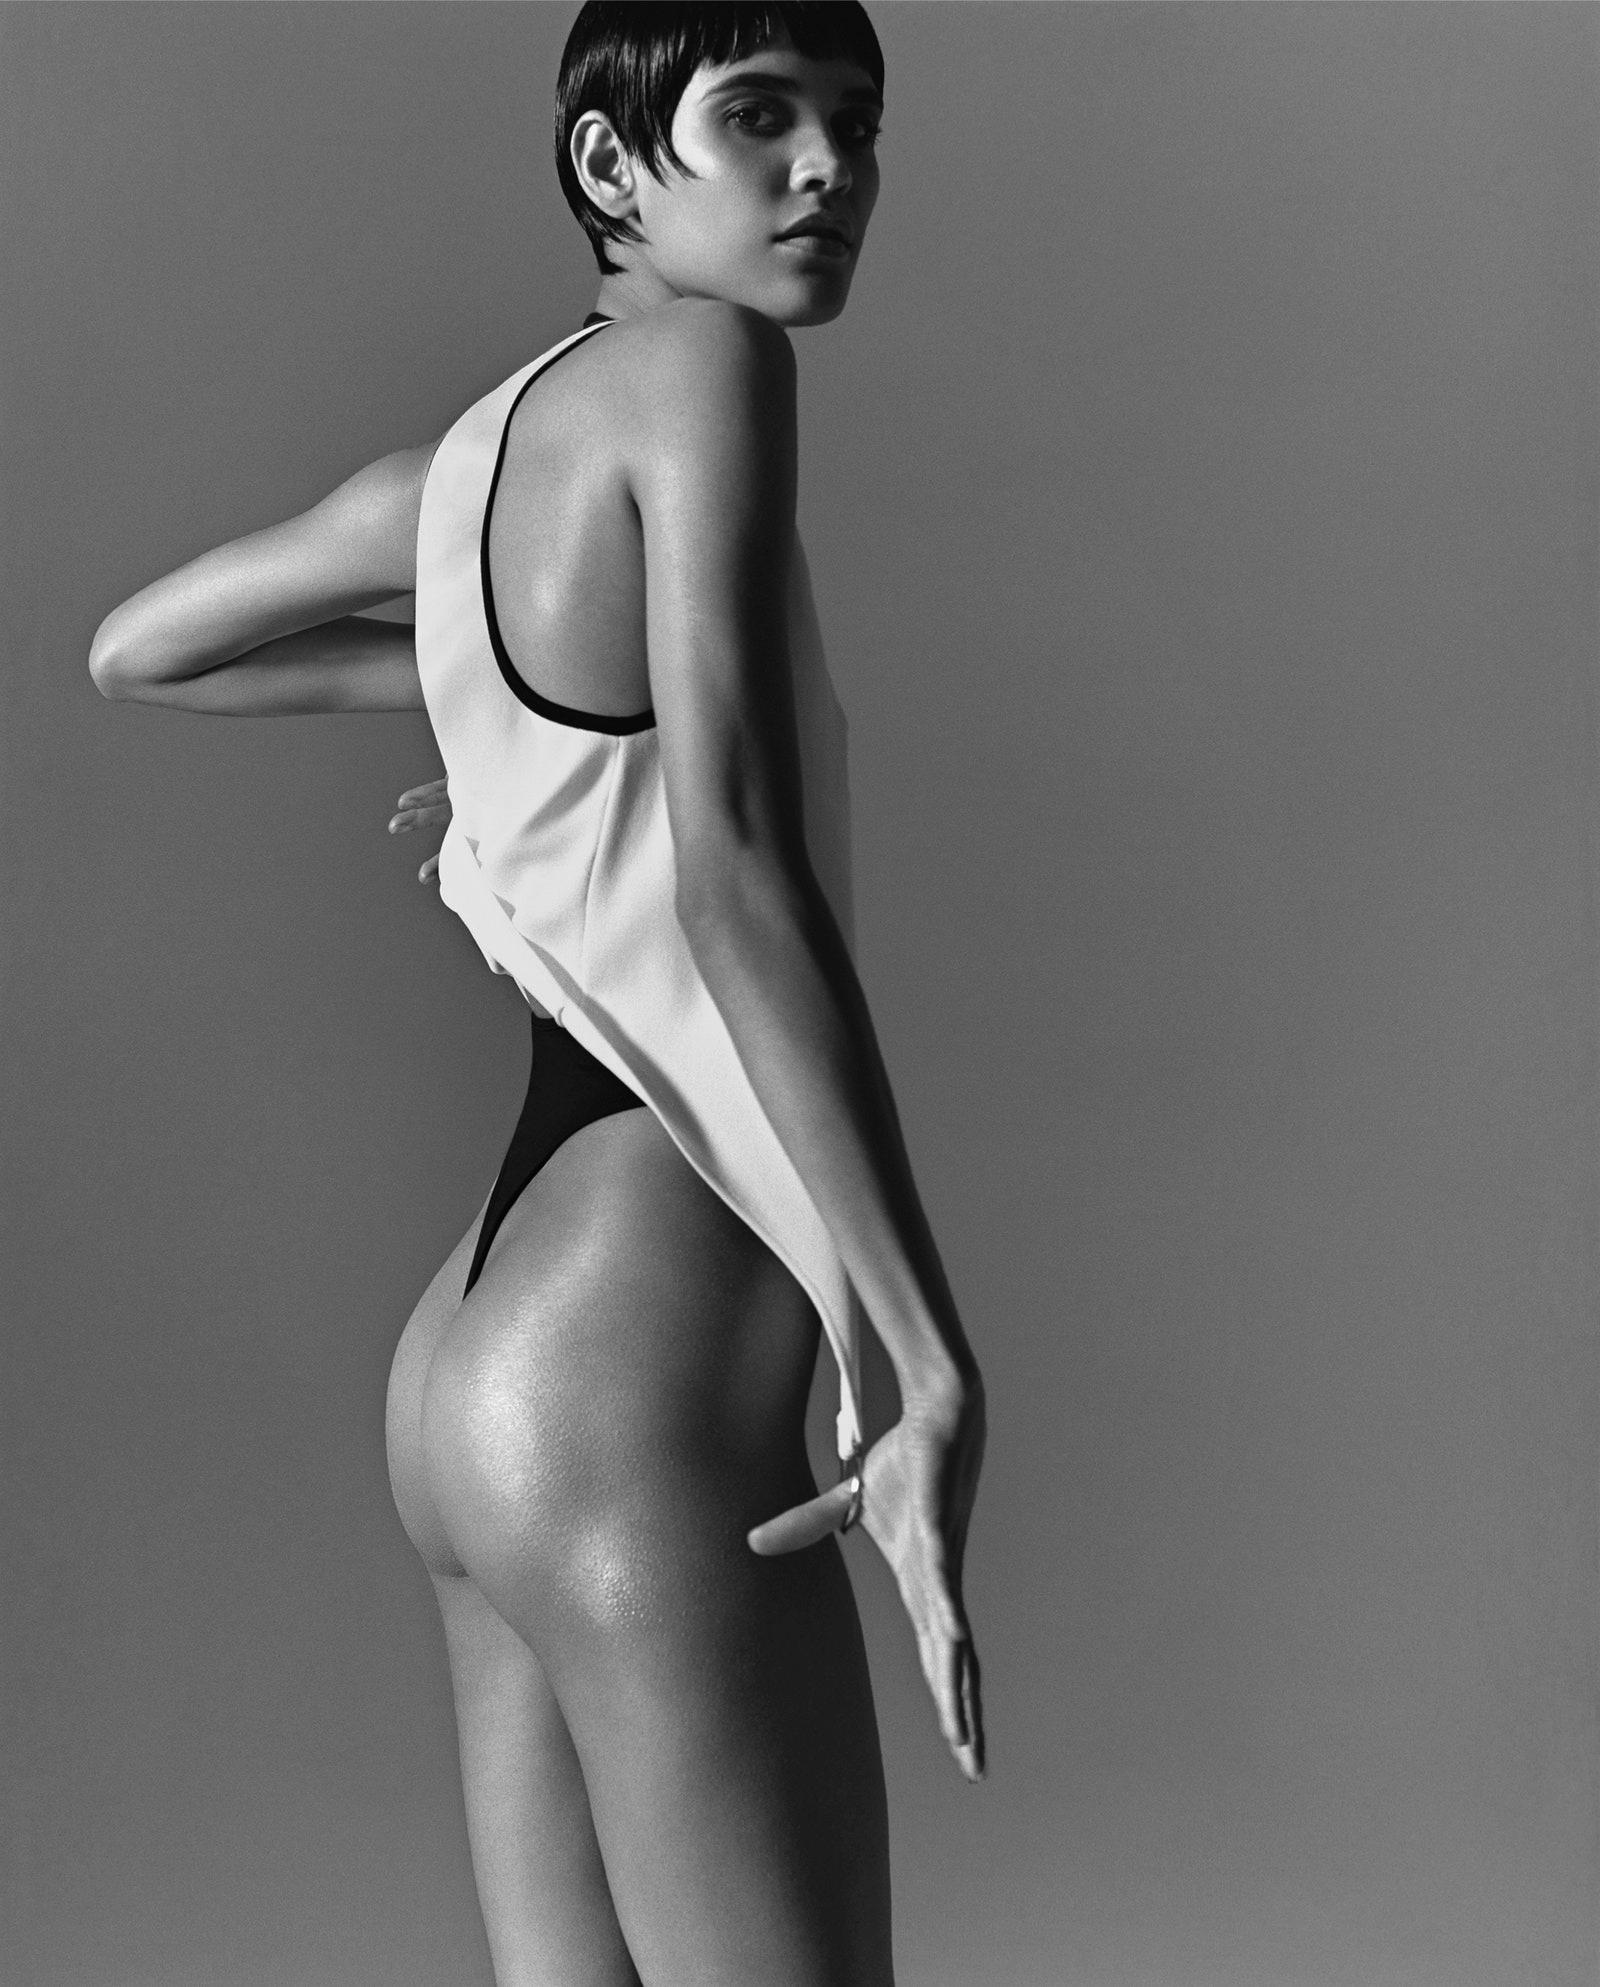 Rudi Gernreich 2019 - Коллекция бикини со стрингами